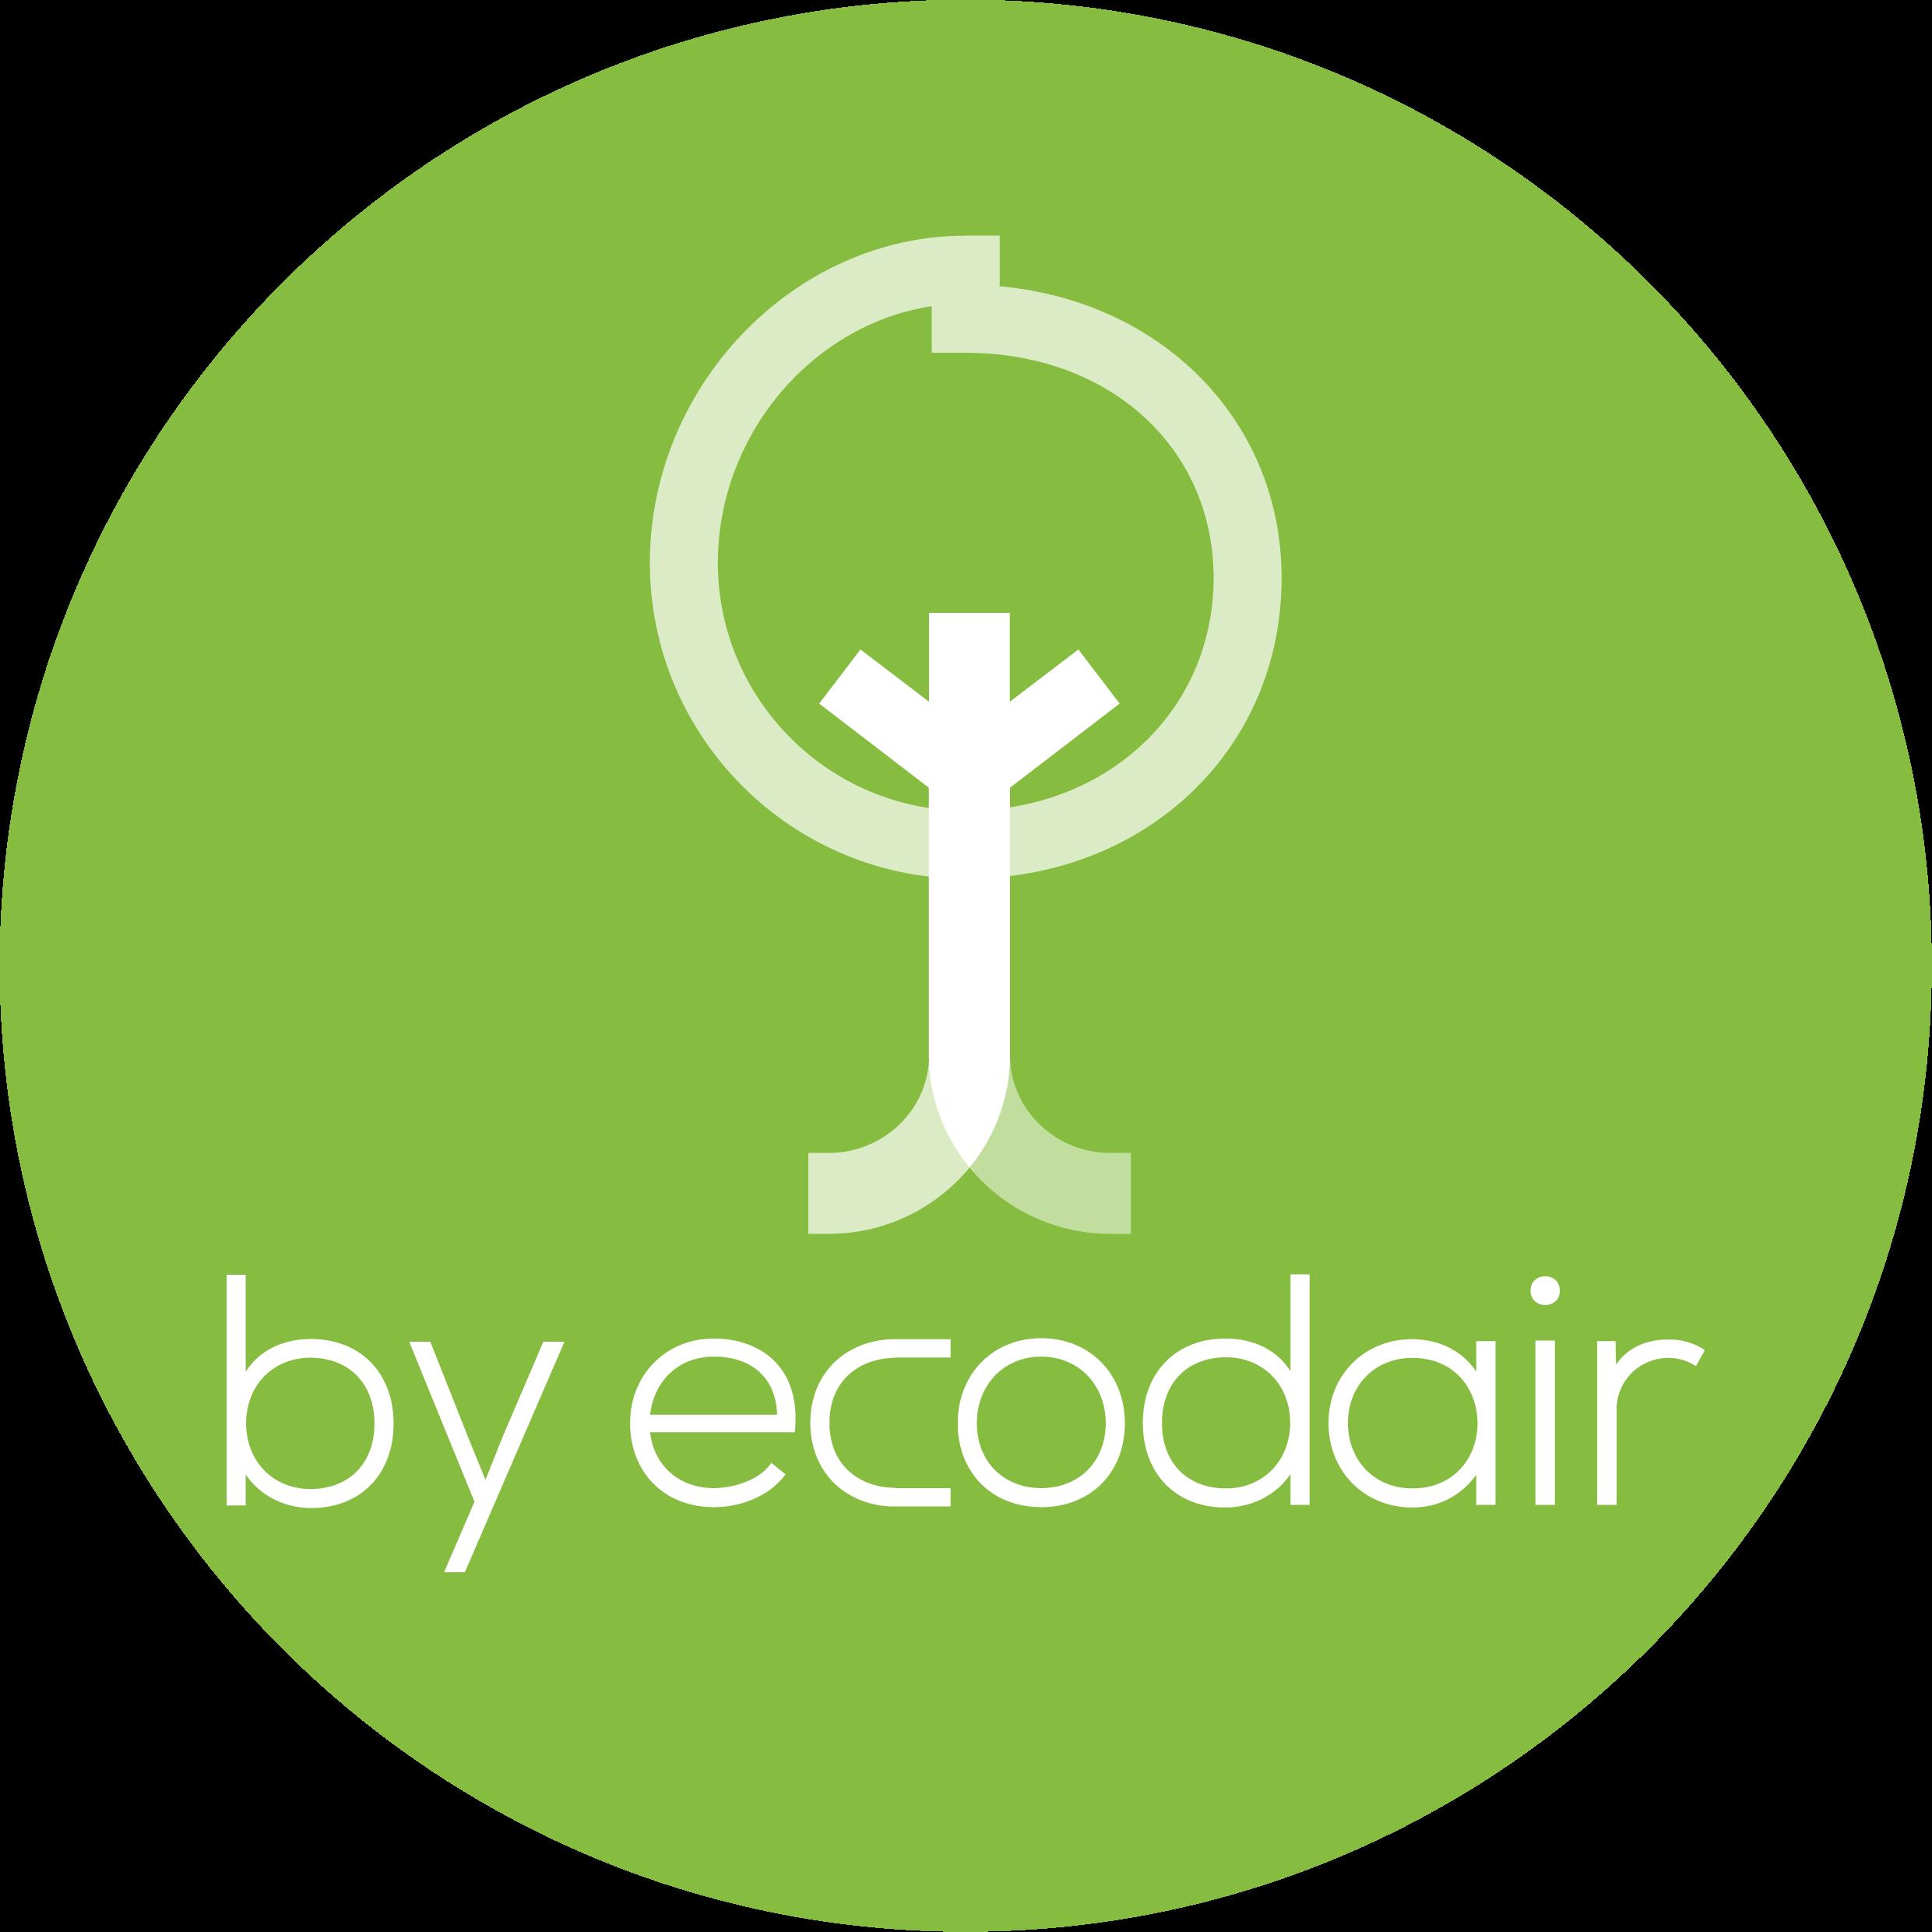 Ecodair-Label-HD-Vert-reserve-2